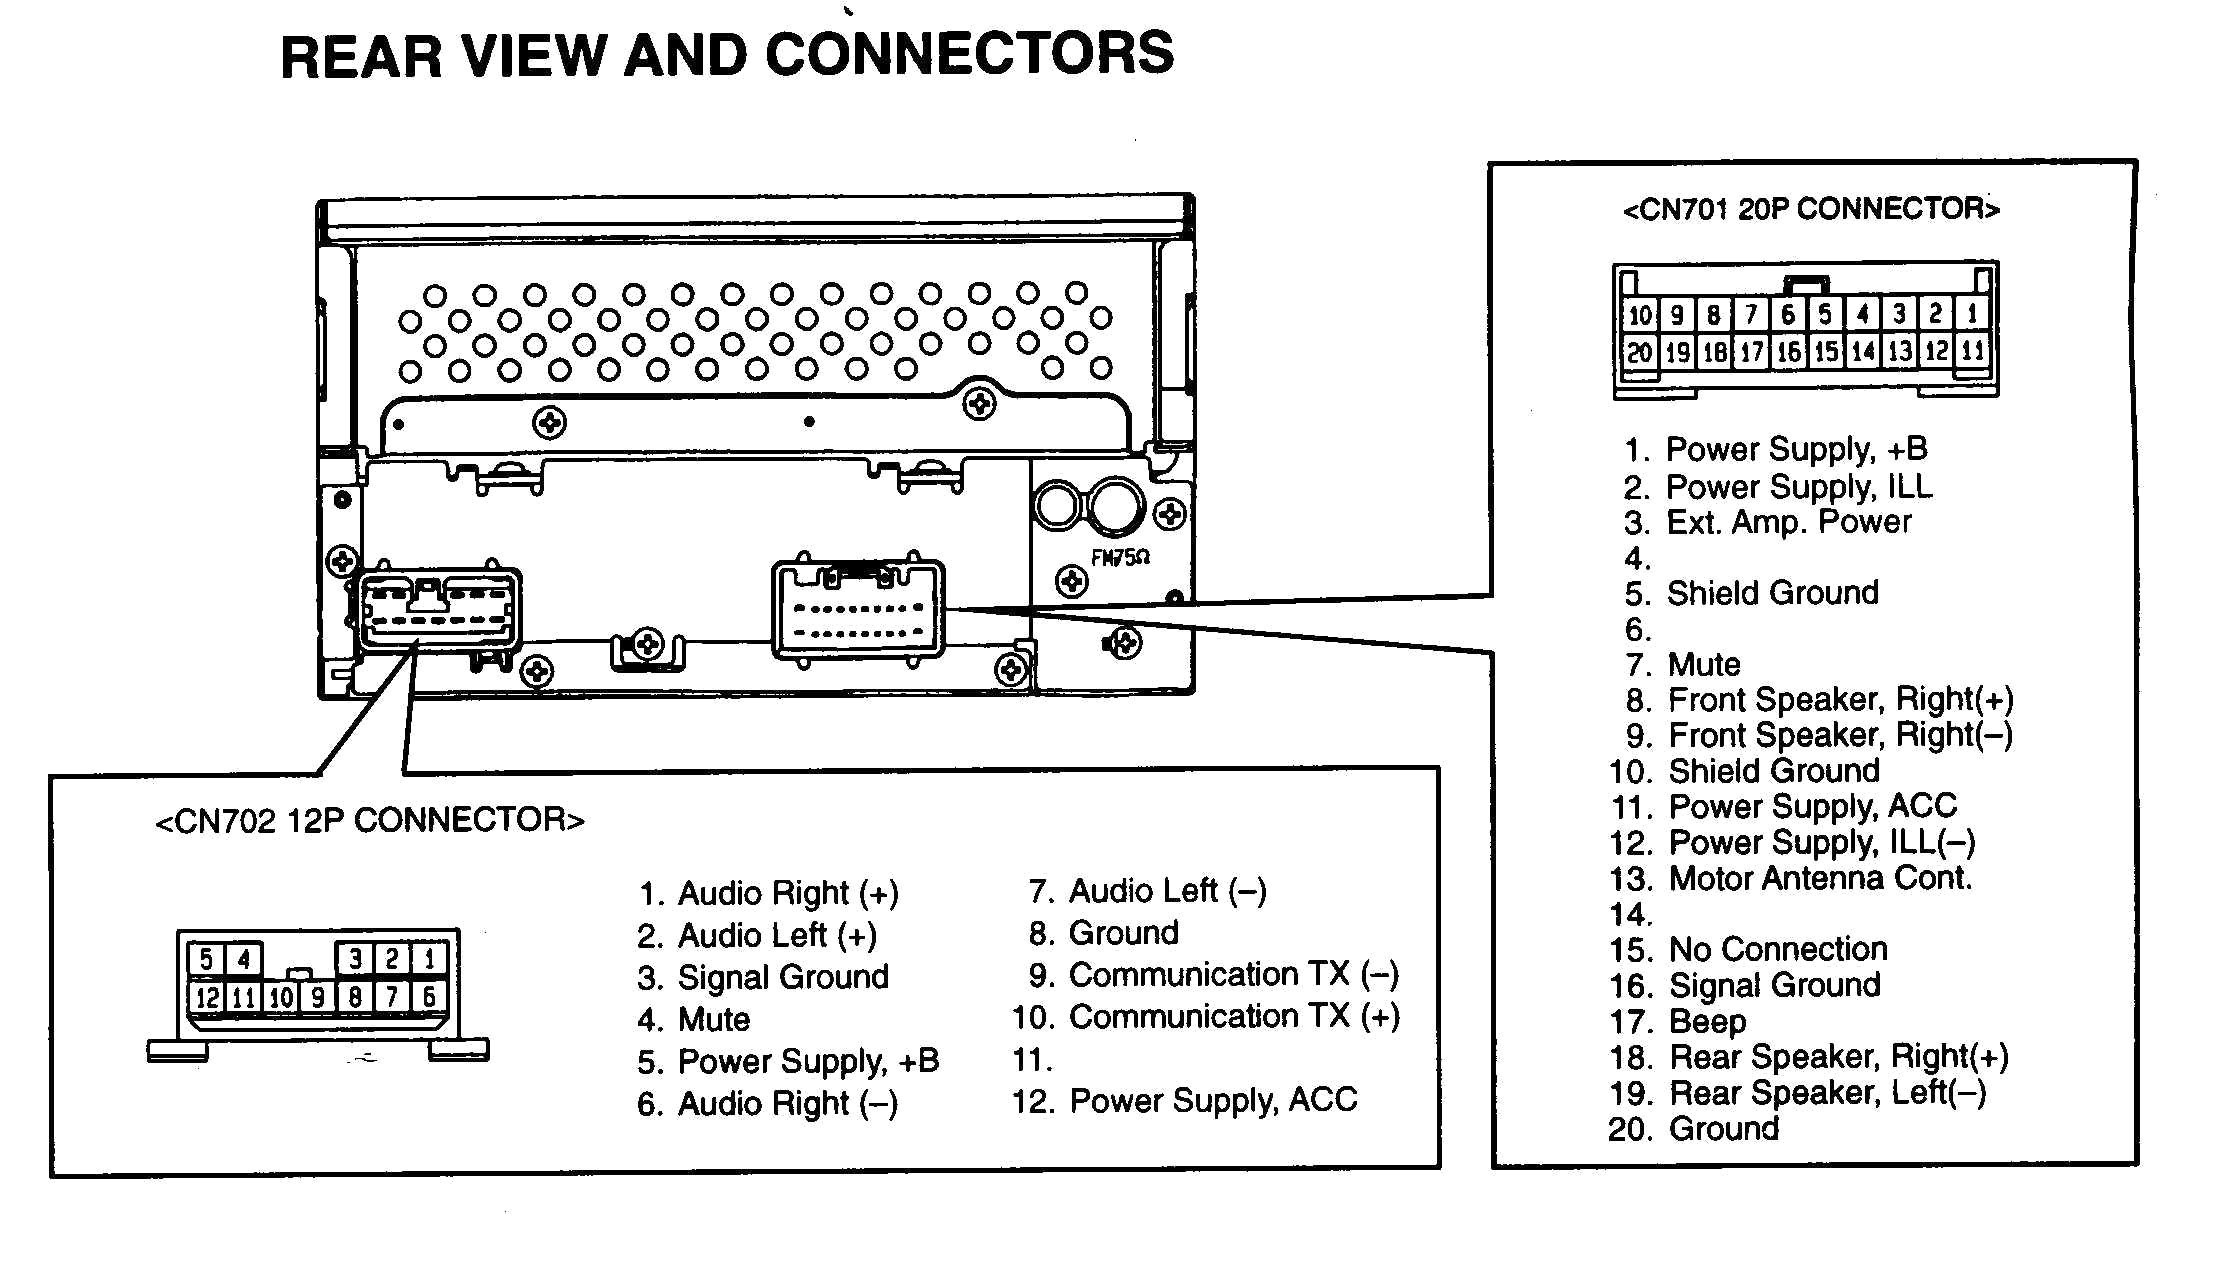 1999 toyota Avalon Engine Diagram 1996 toyota Avalon Stereo Wiring Diagram Experts Wiring Diagram • Of 1999 toyota Avalon Engine Diagram